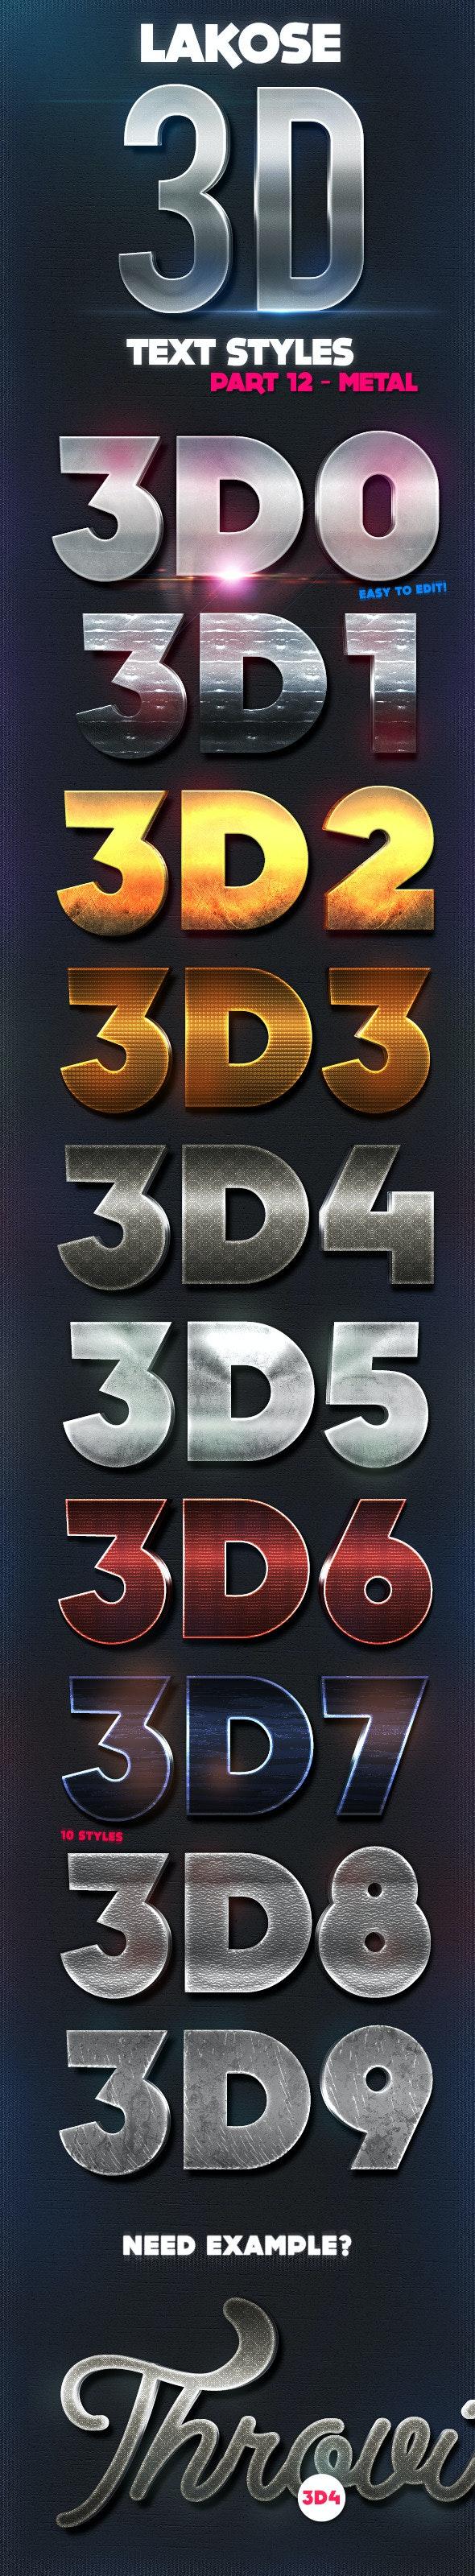 Lakose 3D Text Styles Part 12 - Text Effects Styles